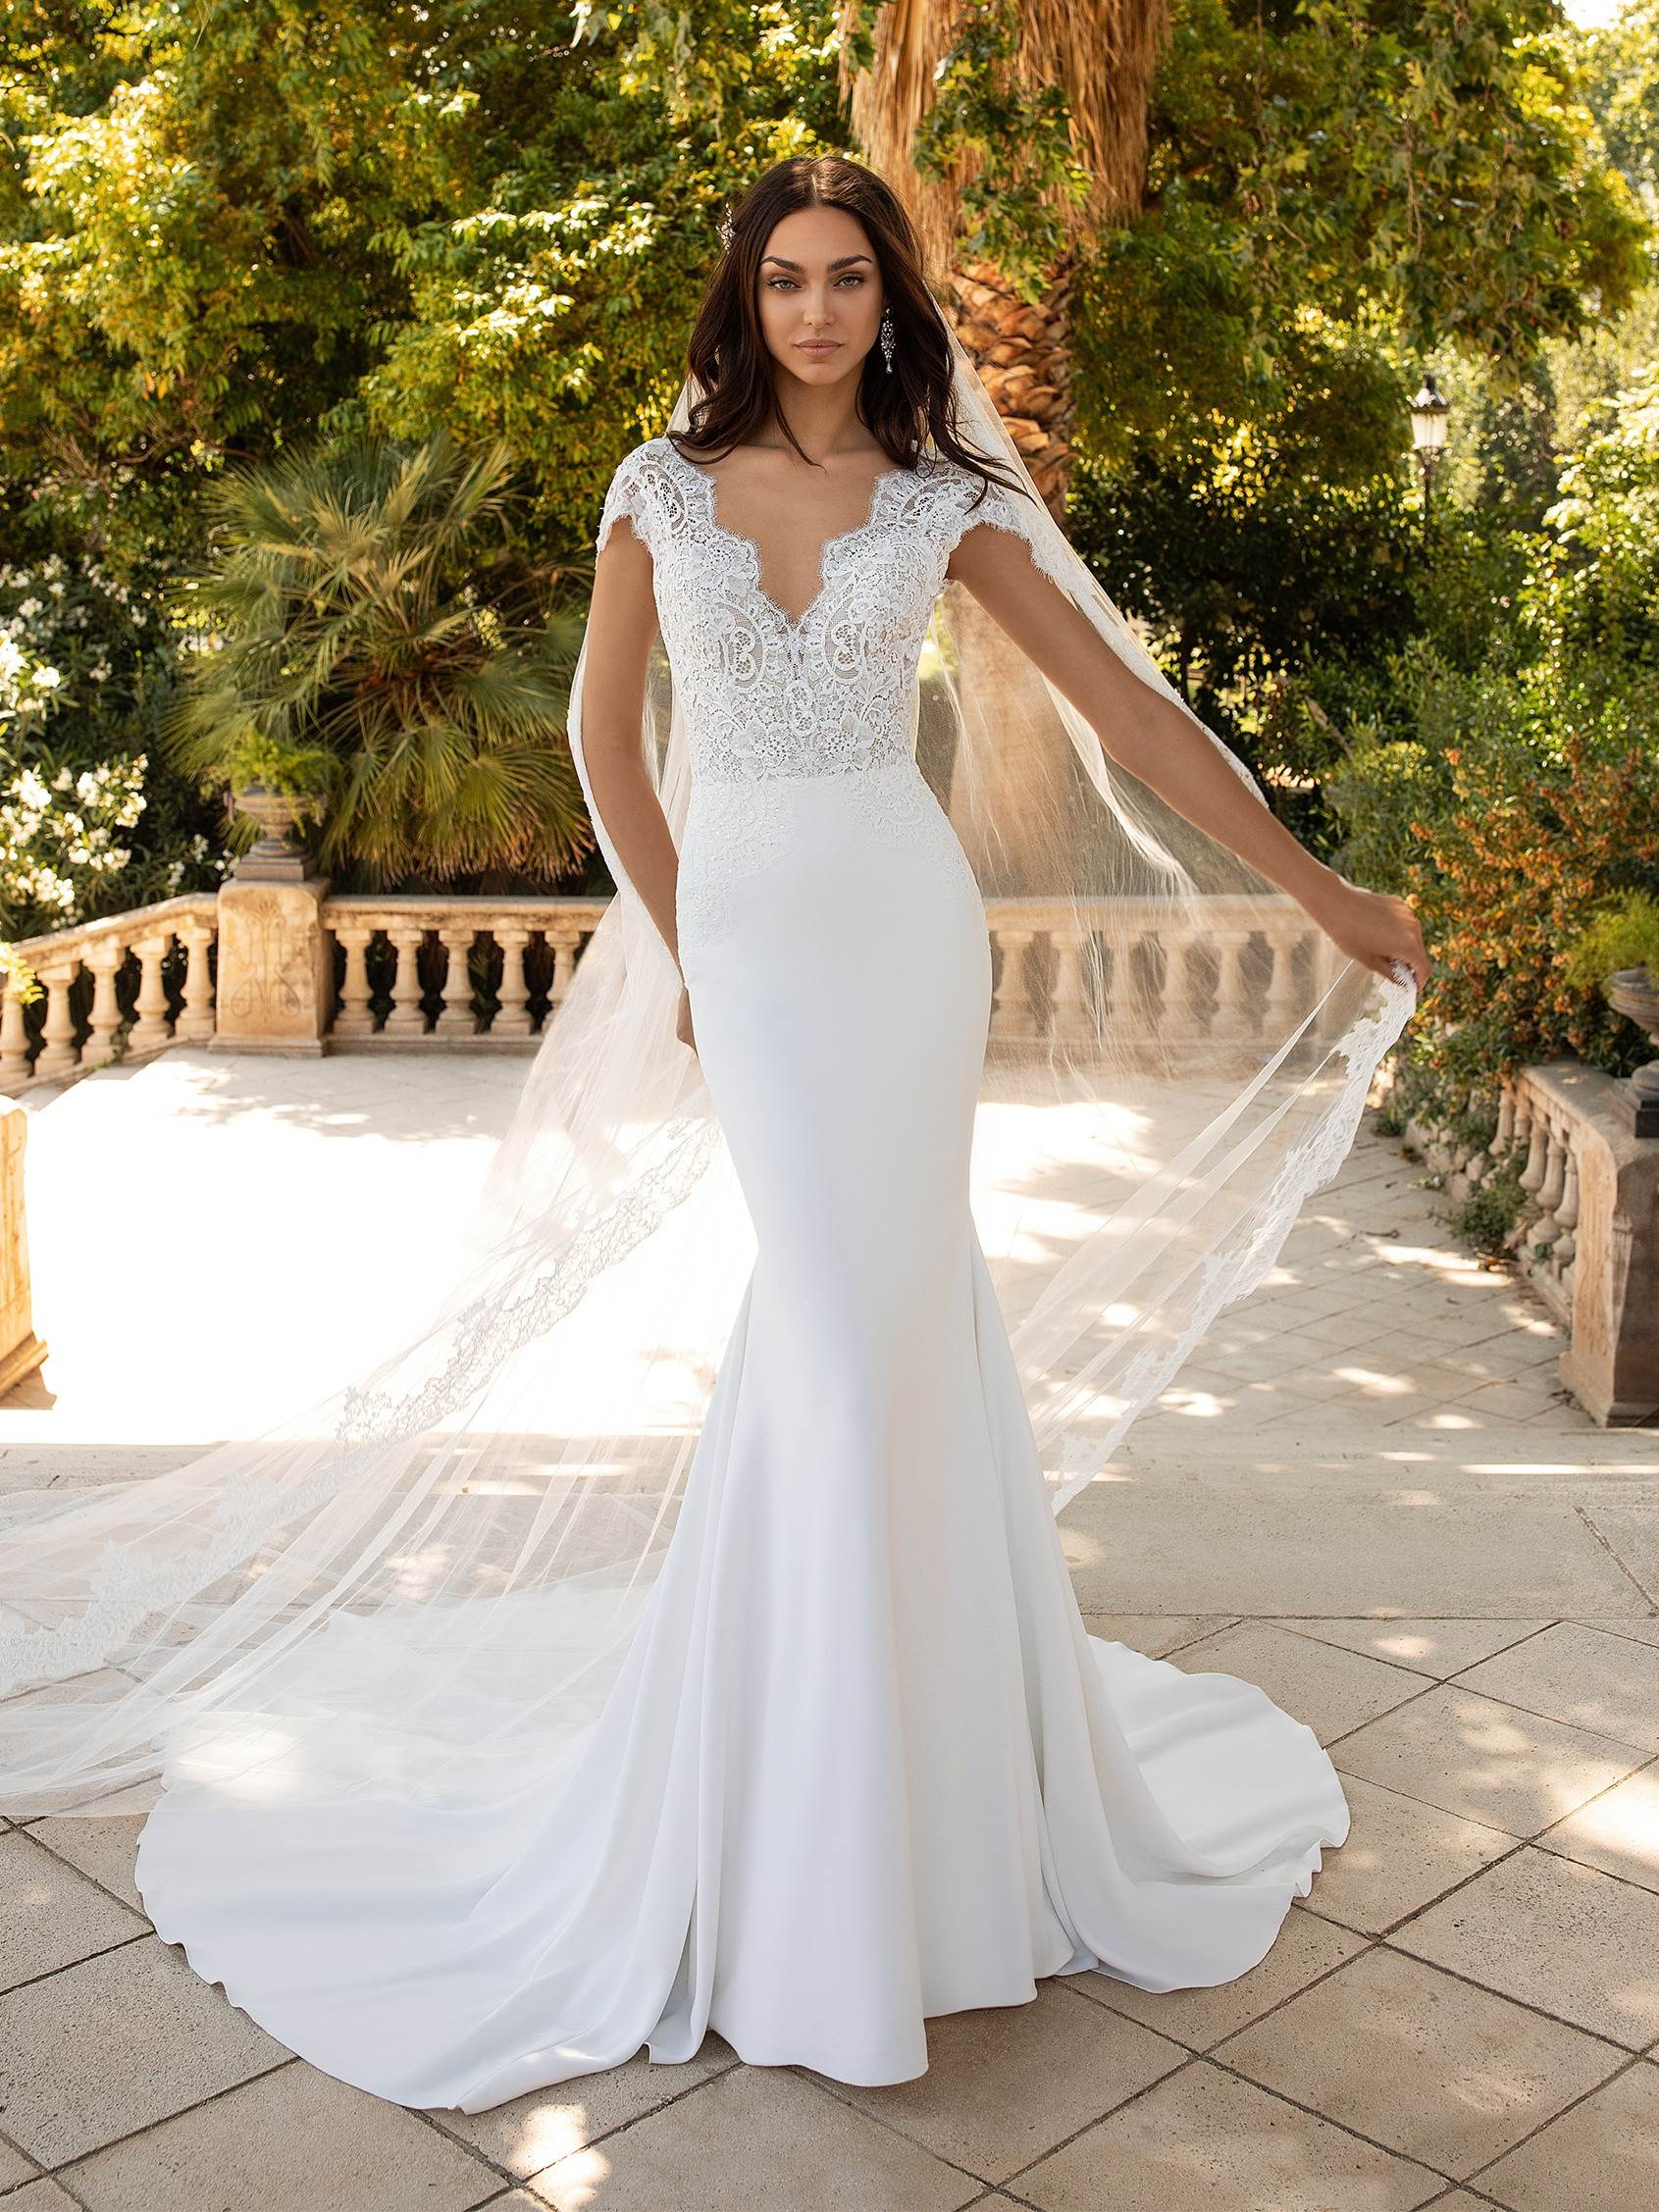 Milady menyasszonyi ruha - Pronovias 2021